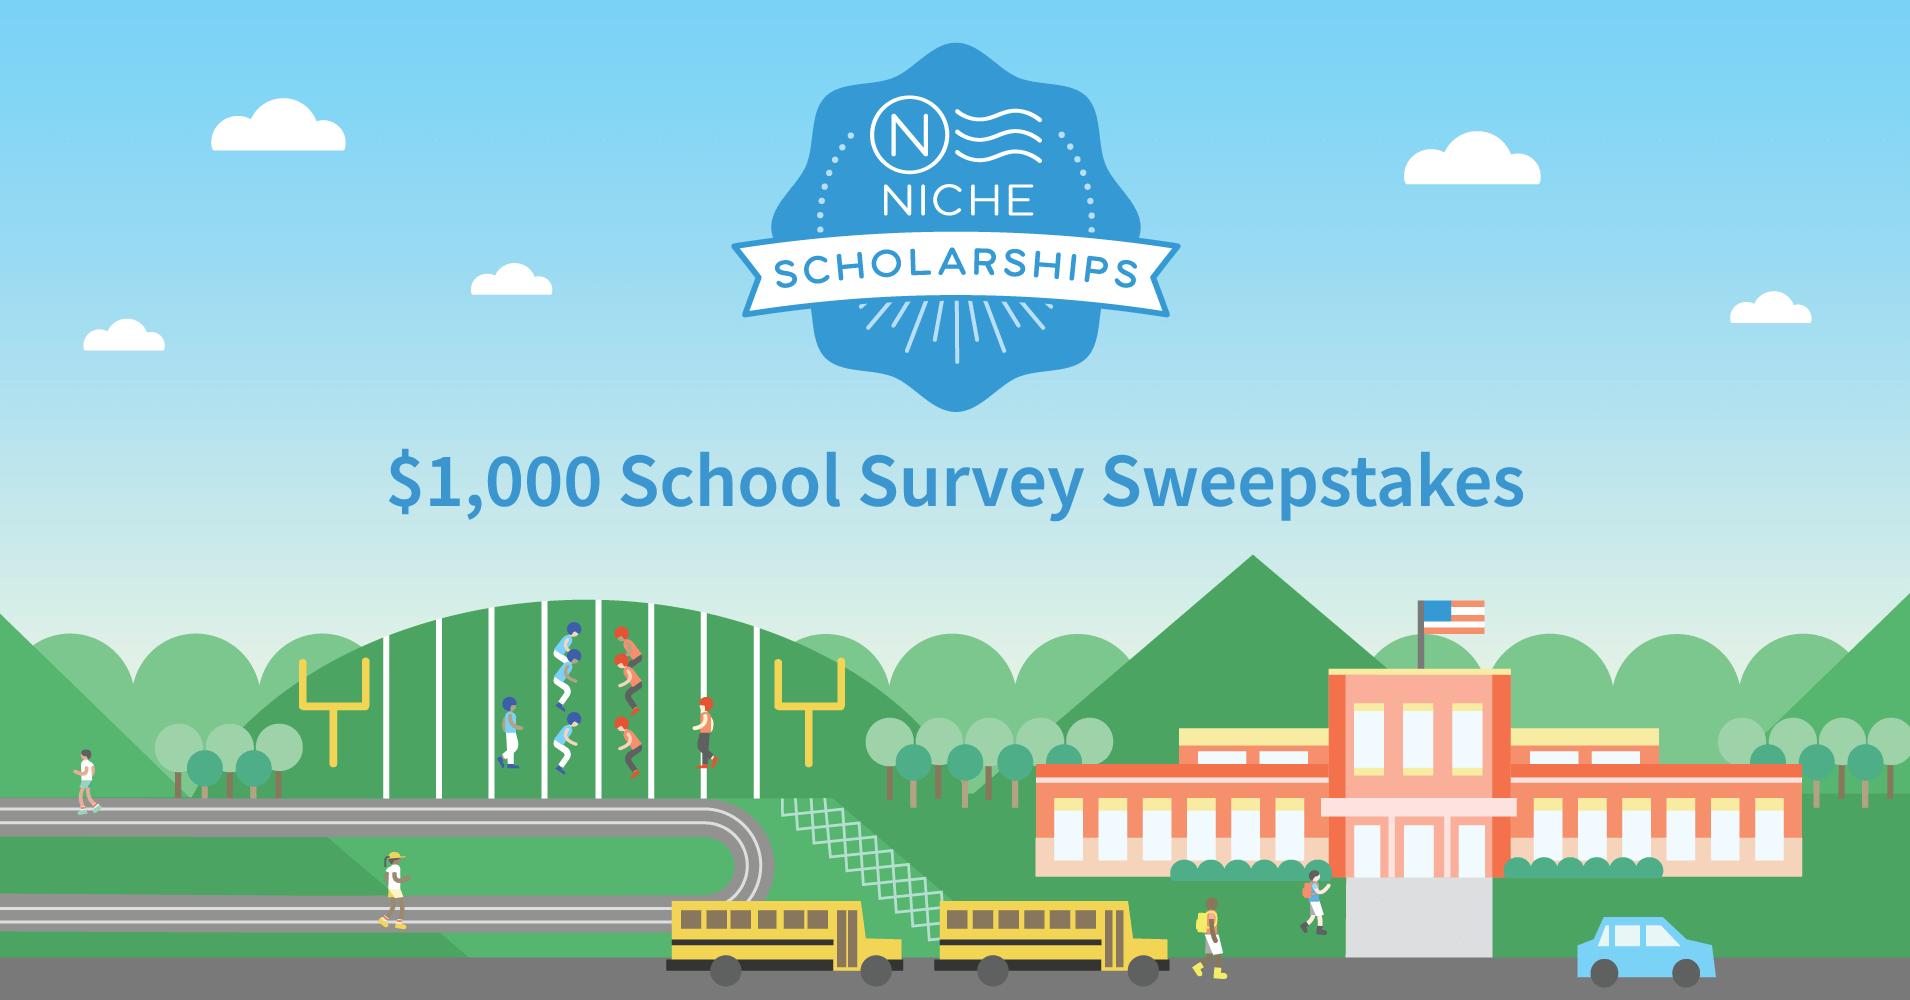 $1,000 School Survey Sweepstakes - Niche